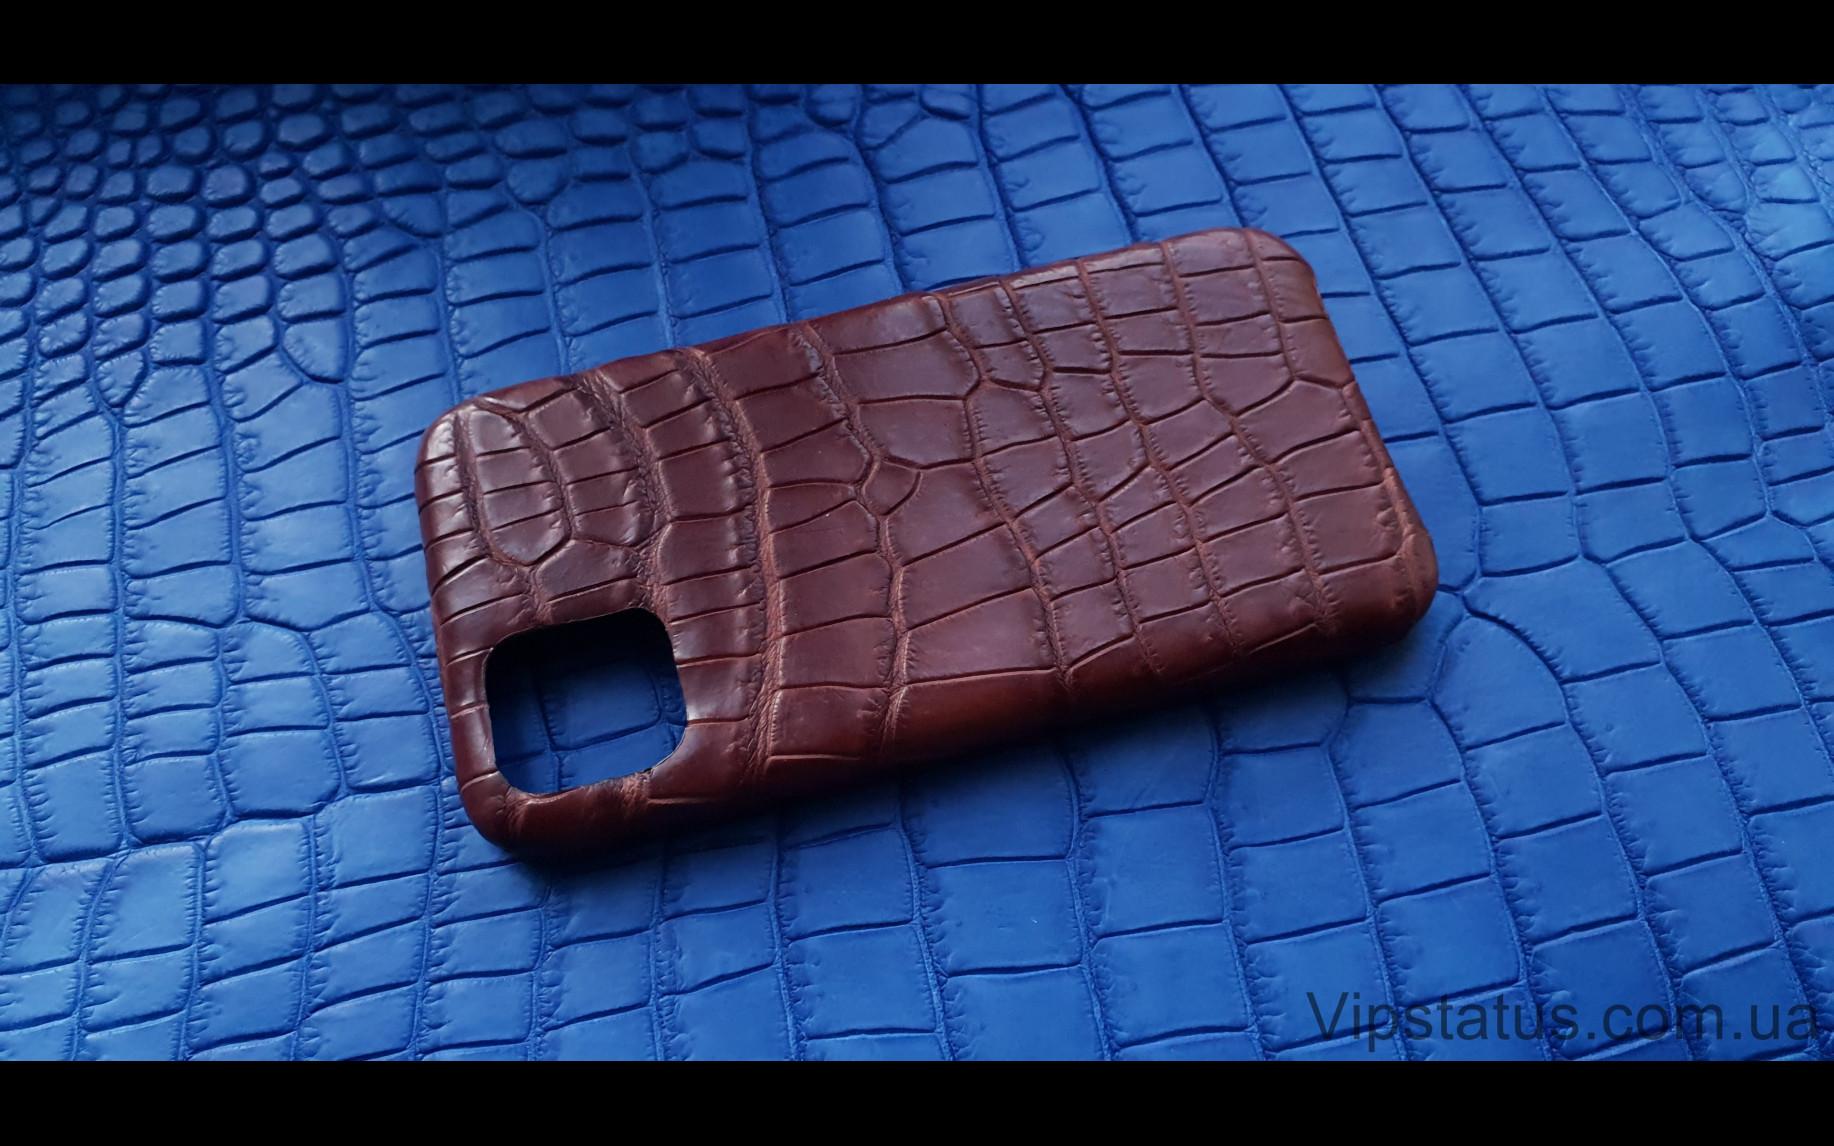 Elite Rich Crocodile Эксклюзивный чехол IPhone 11 Pro Max Rich Crocodile Exclusive case IPhone 11 Pro Max Crocodile leather image 1